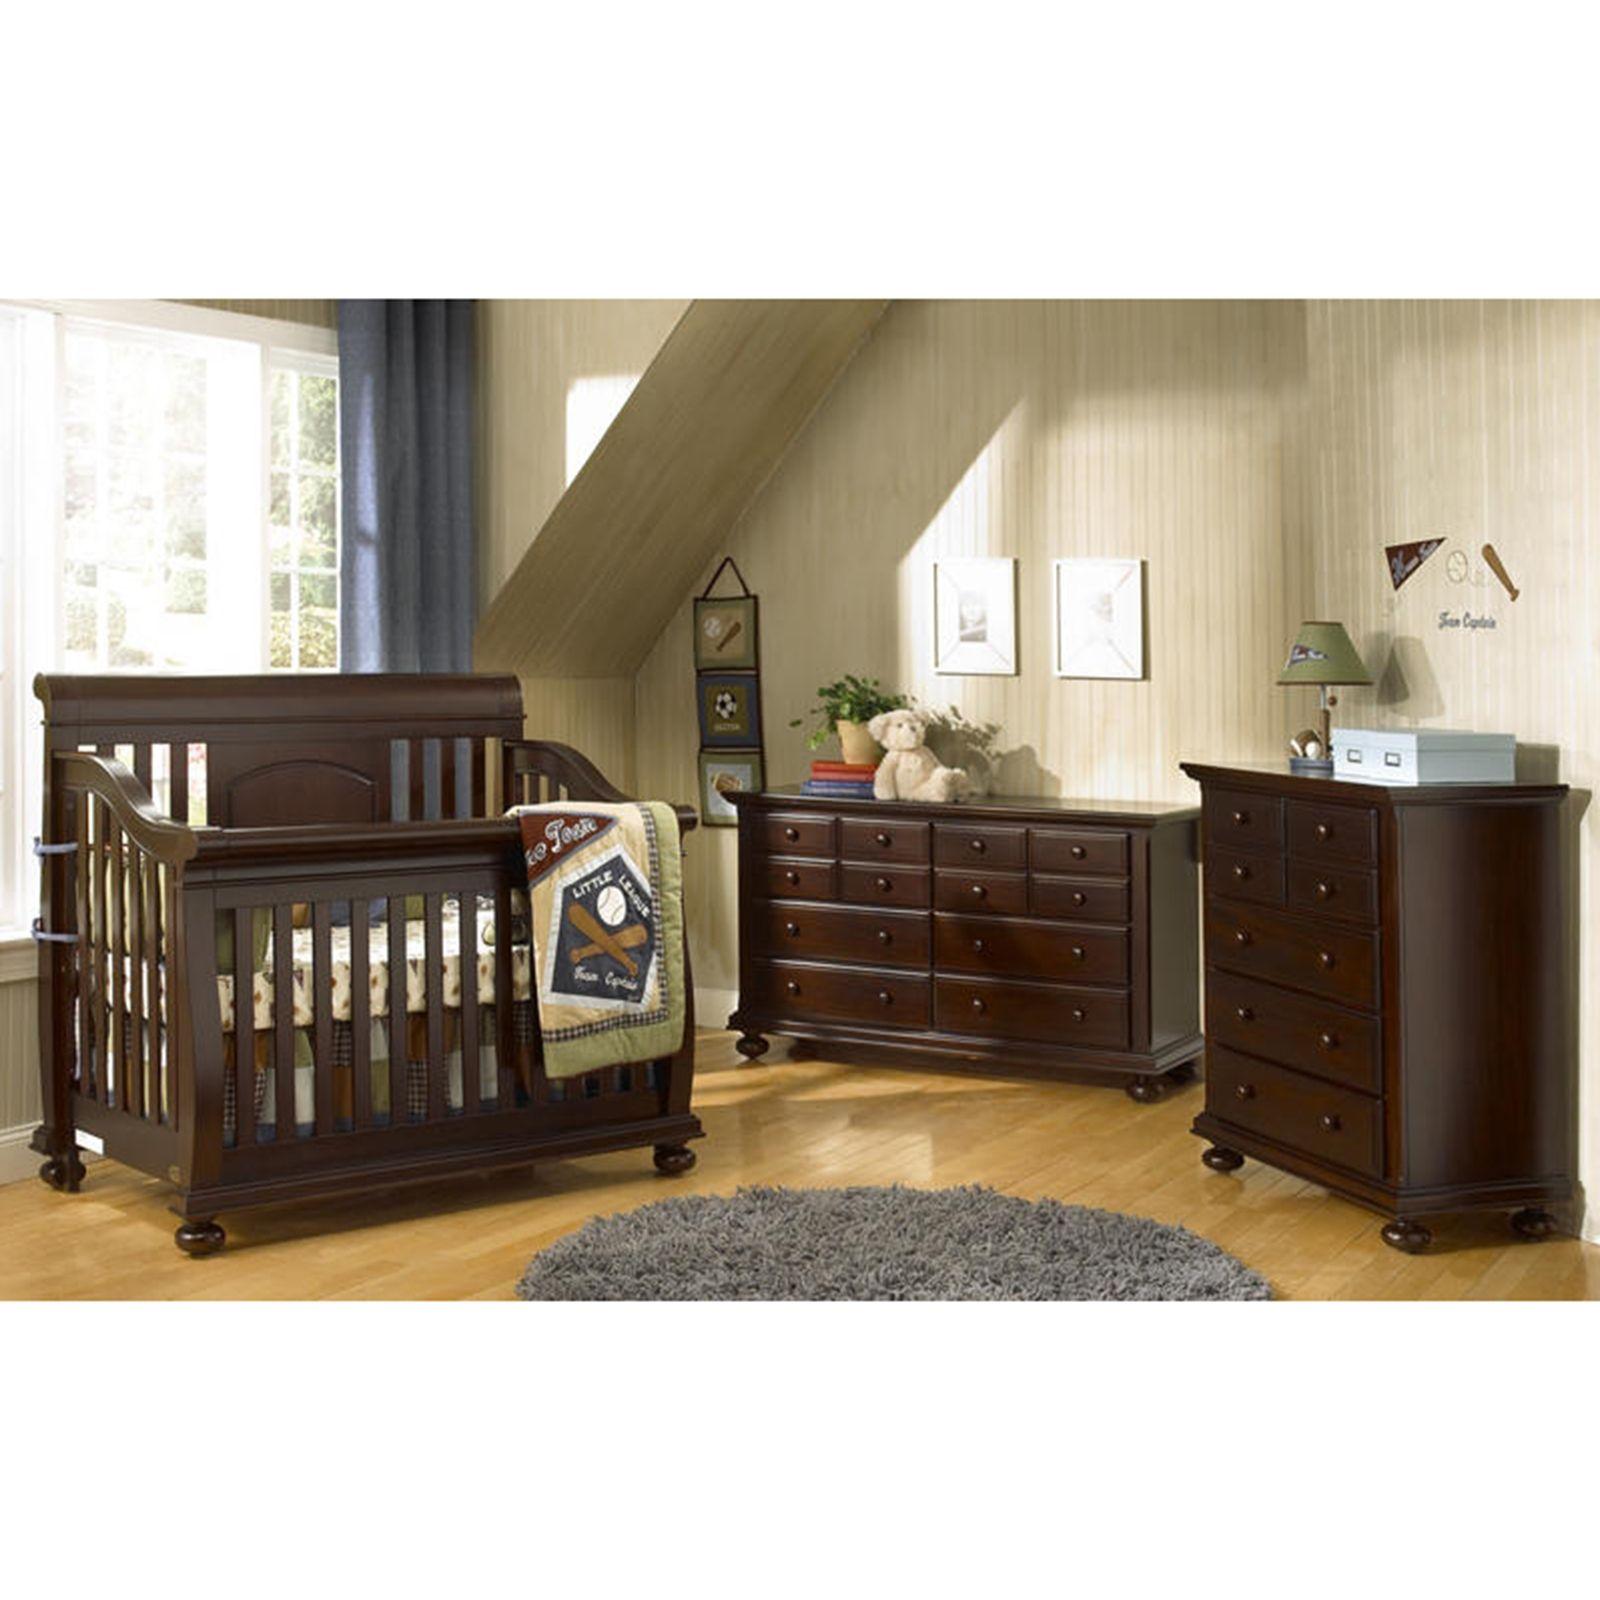 Barcelona Collection Burlington Coat Factory | Best Baby for Burlington Coat Factory Baby Furniture